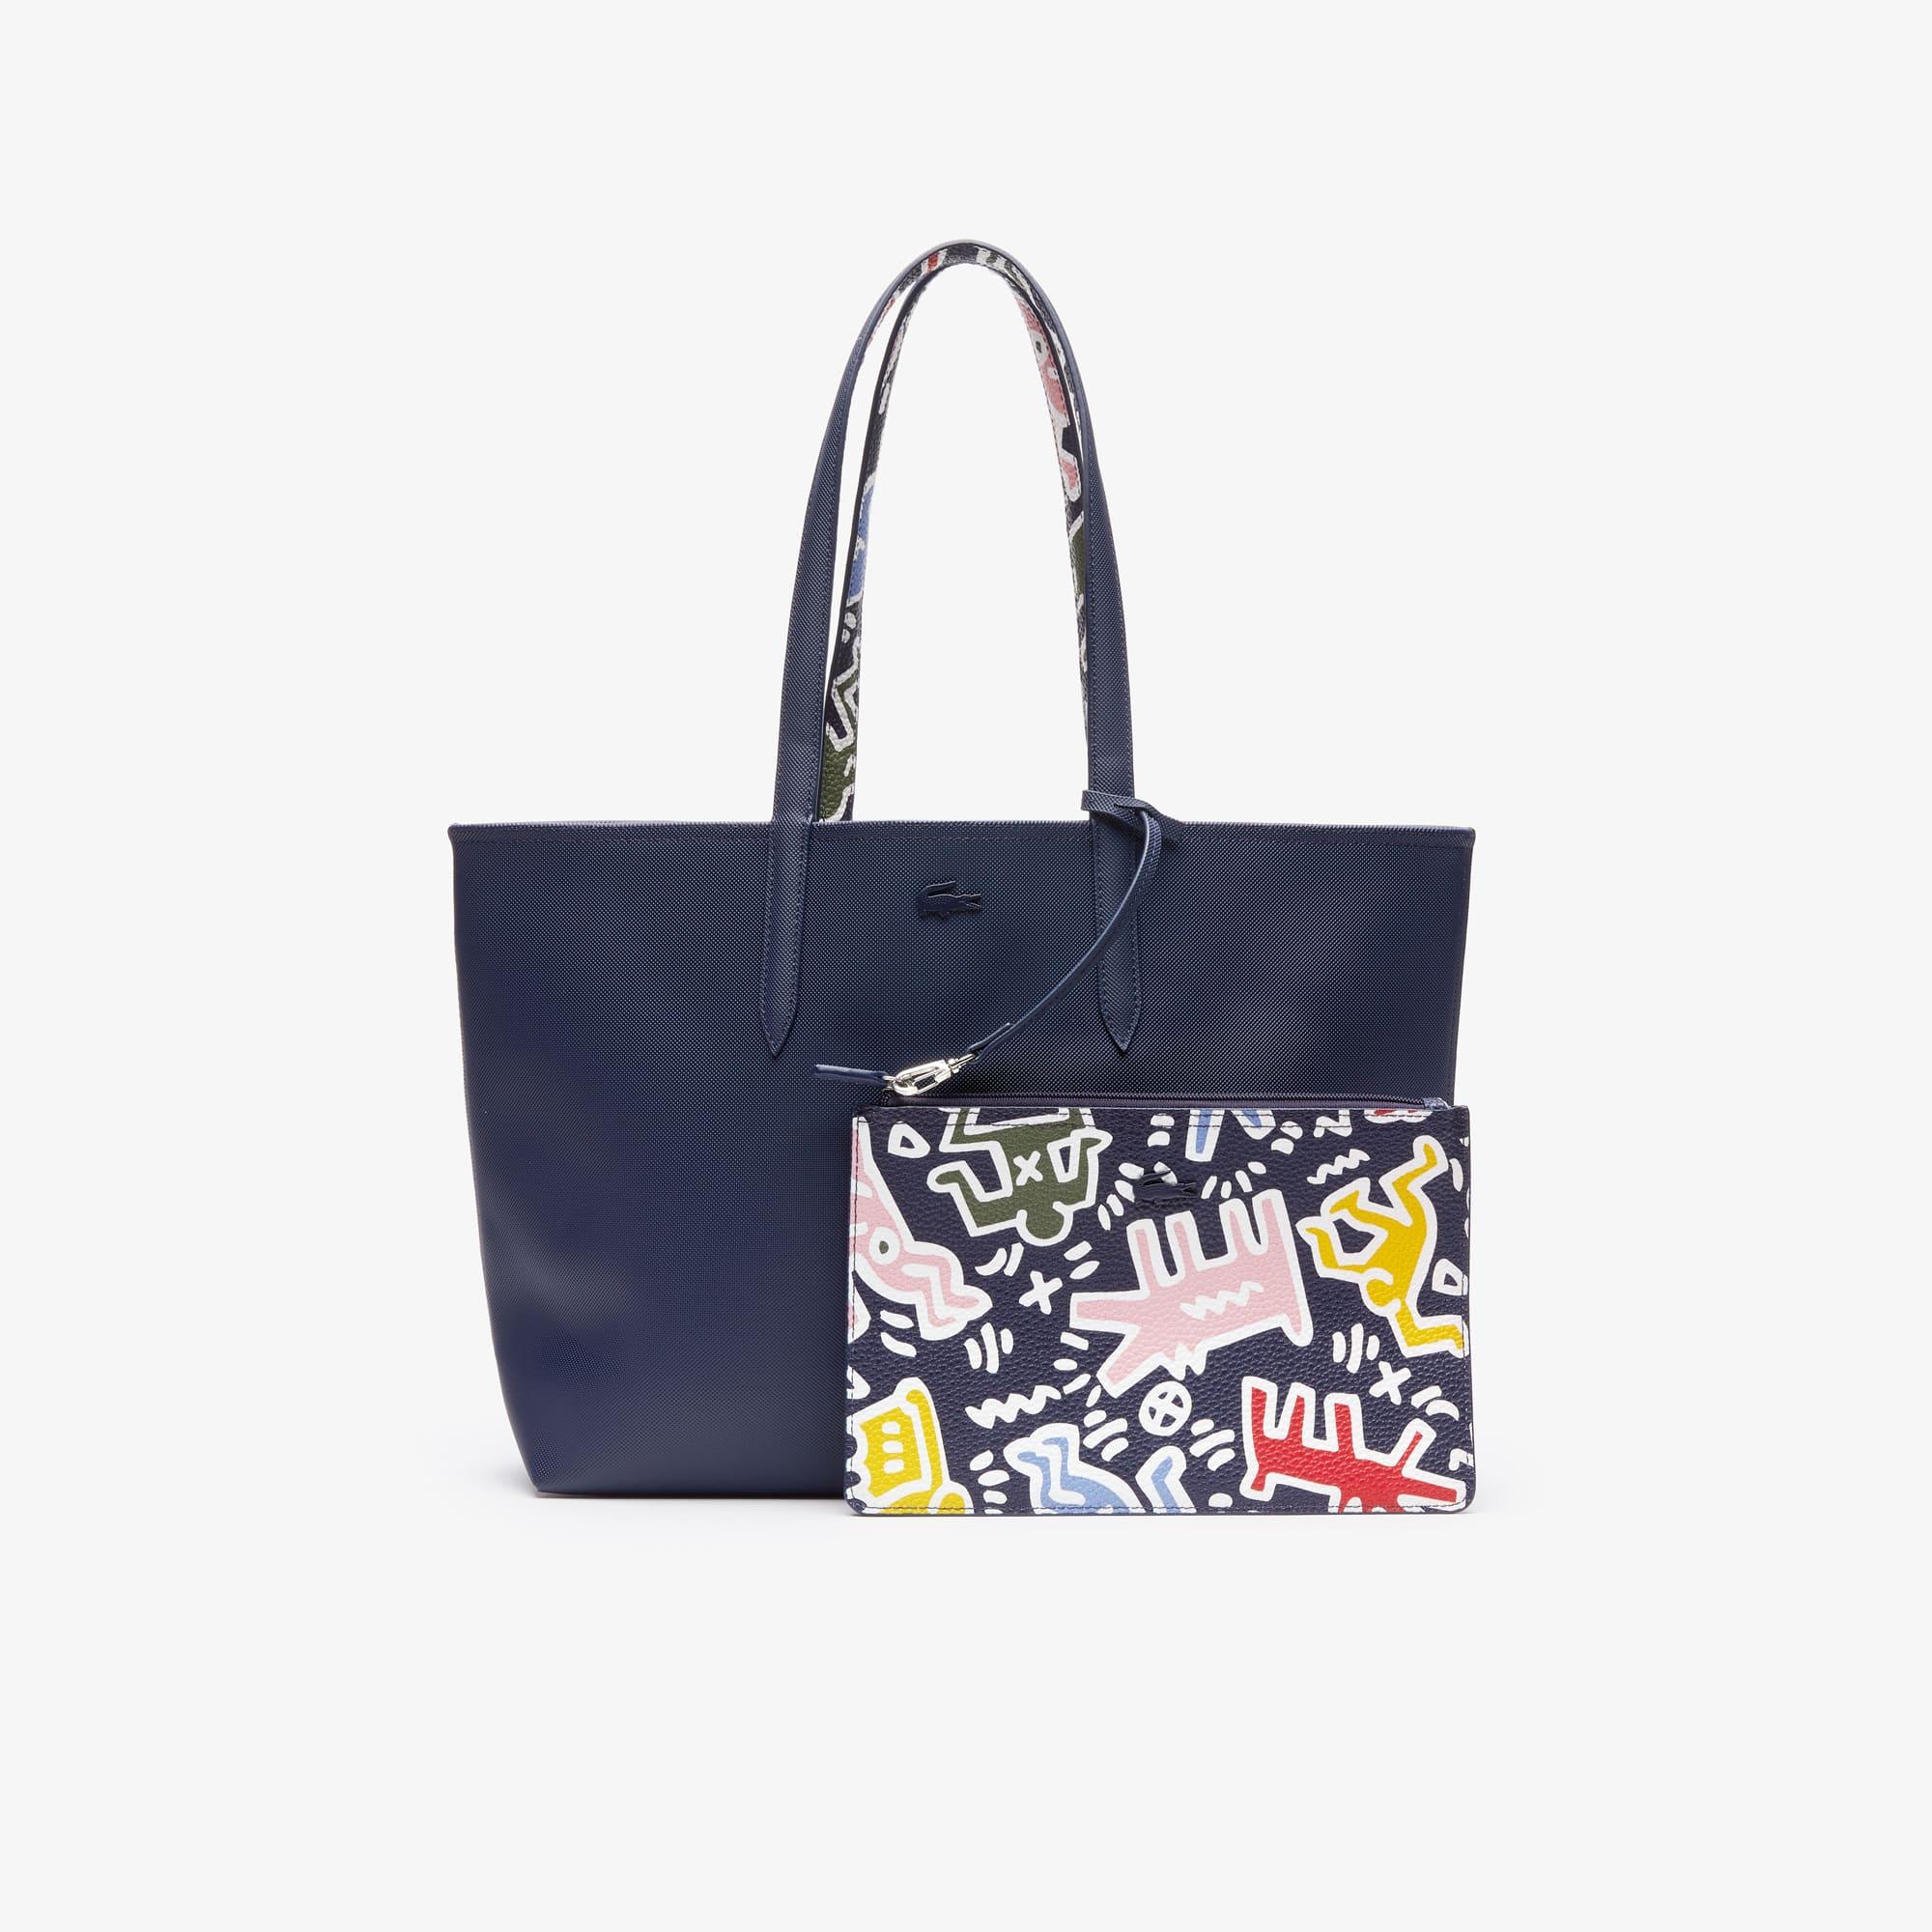 522ad142c8a Edition Limitée. Sac cabas réversible Anna Collab Keith Haring